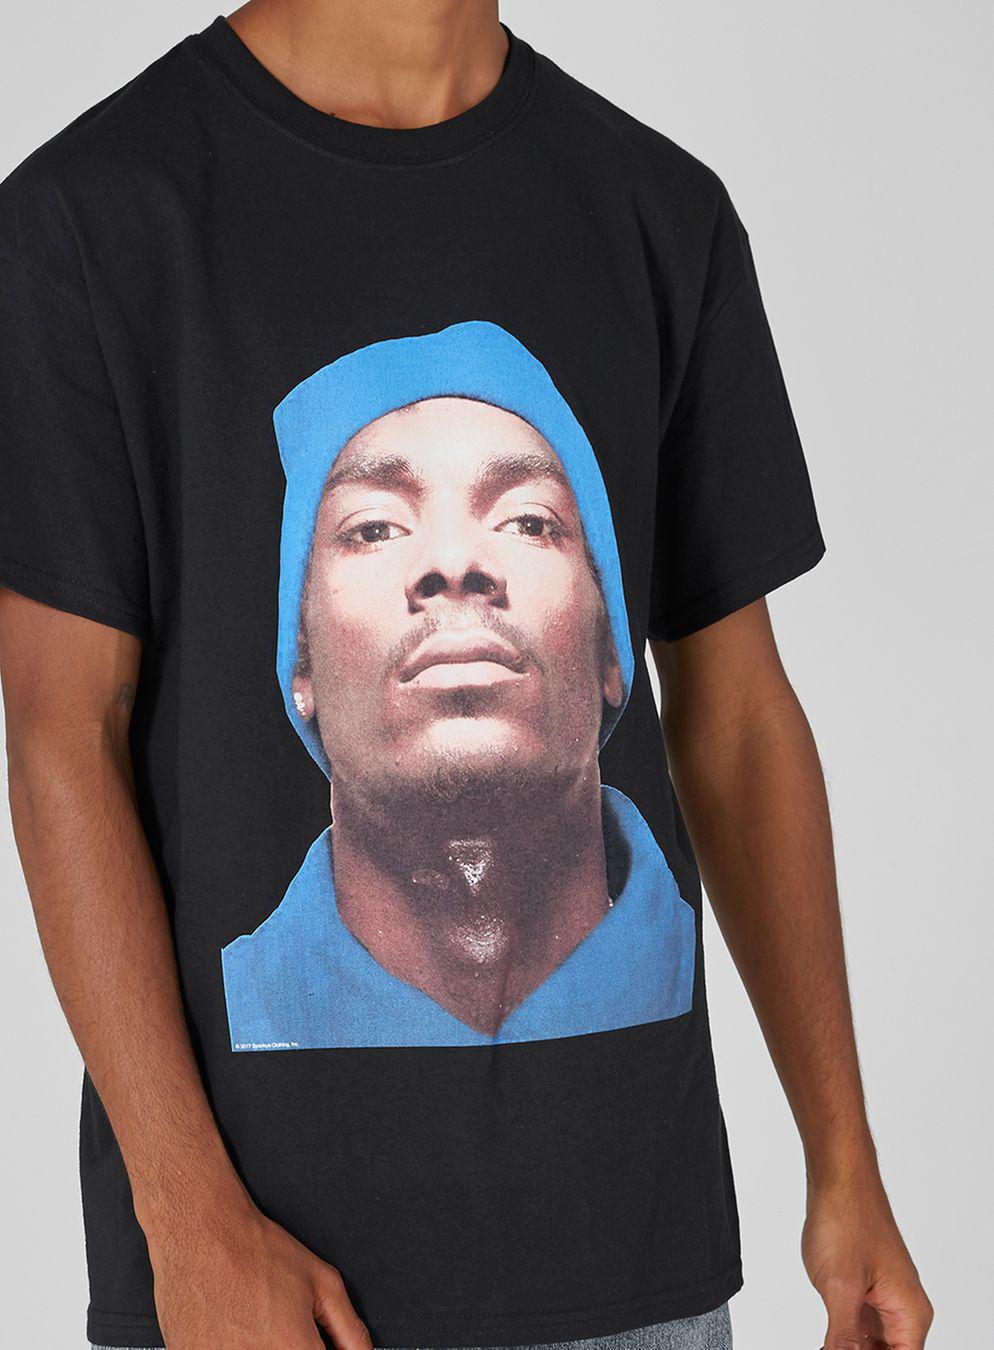 60e7ad4c TOPMAN Snoop Dogg Print T-shirt in Black for Men - Lyst